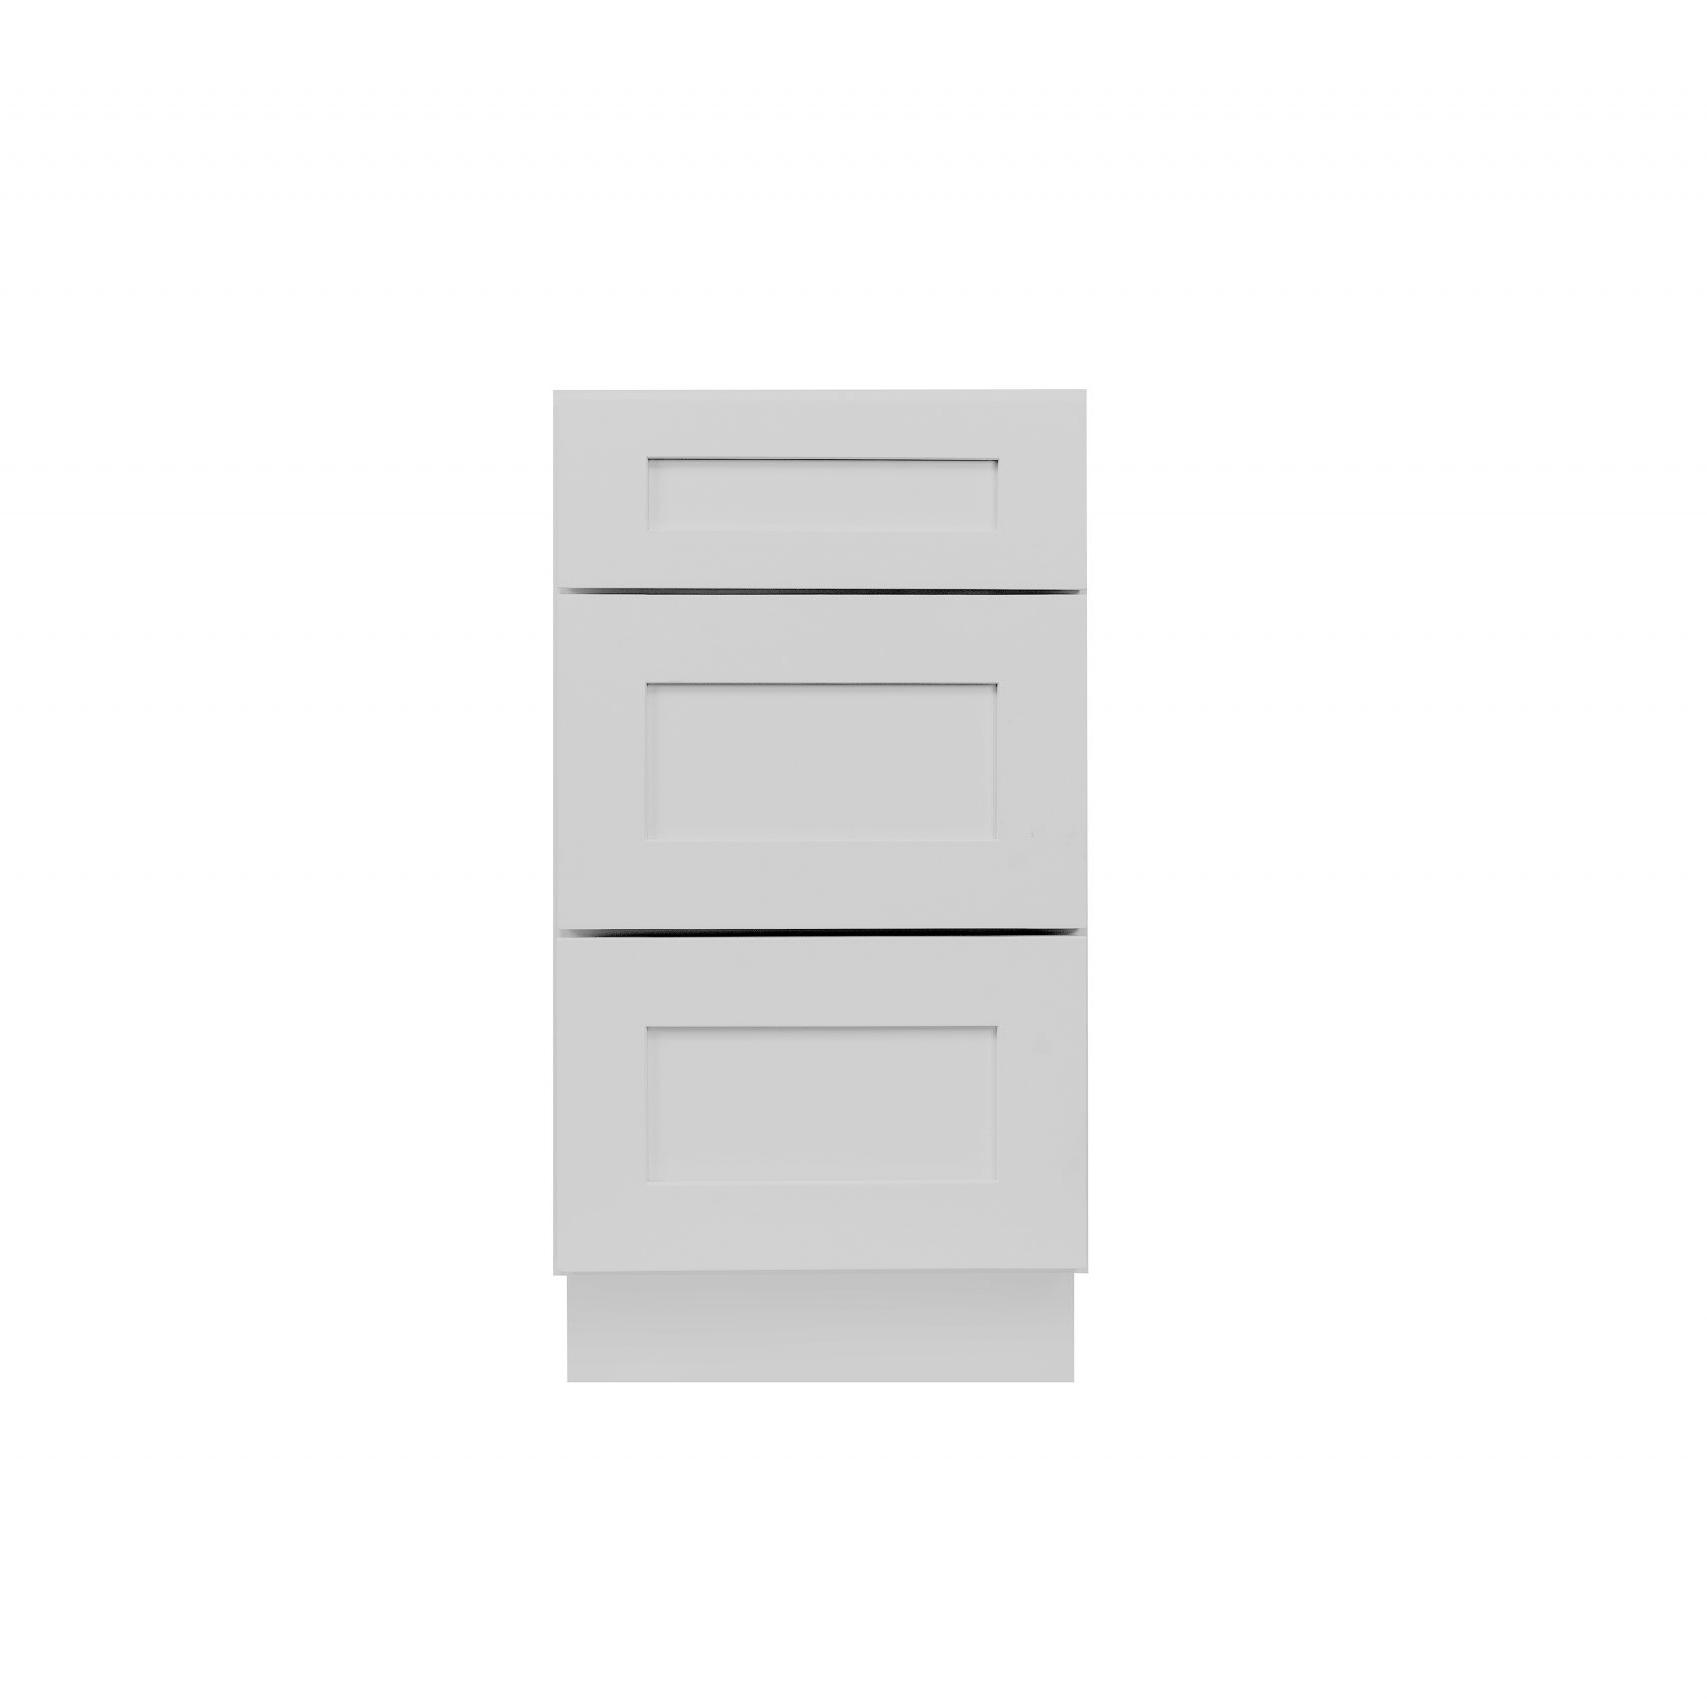 Gray Shaker Cabinetry DB12, DB15, DB18, DB21, DB24, DB30, DB36